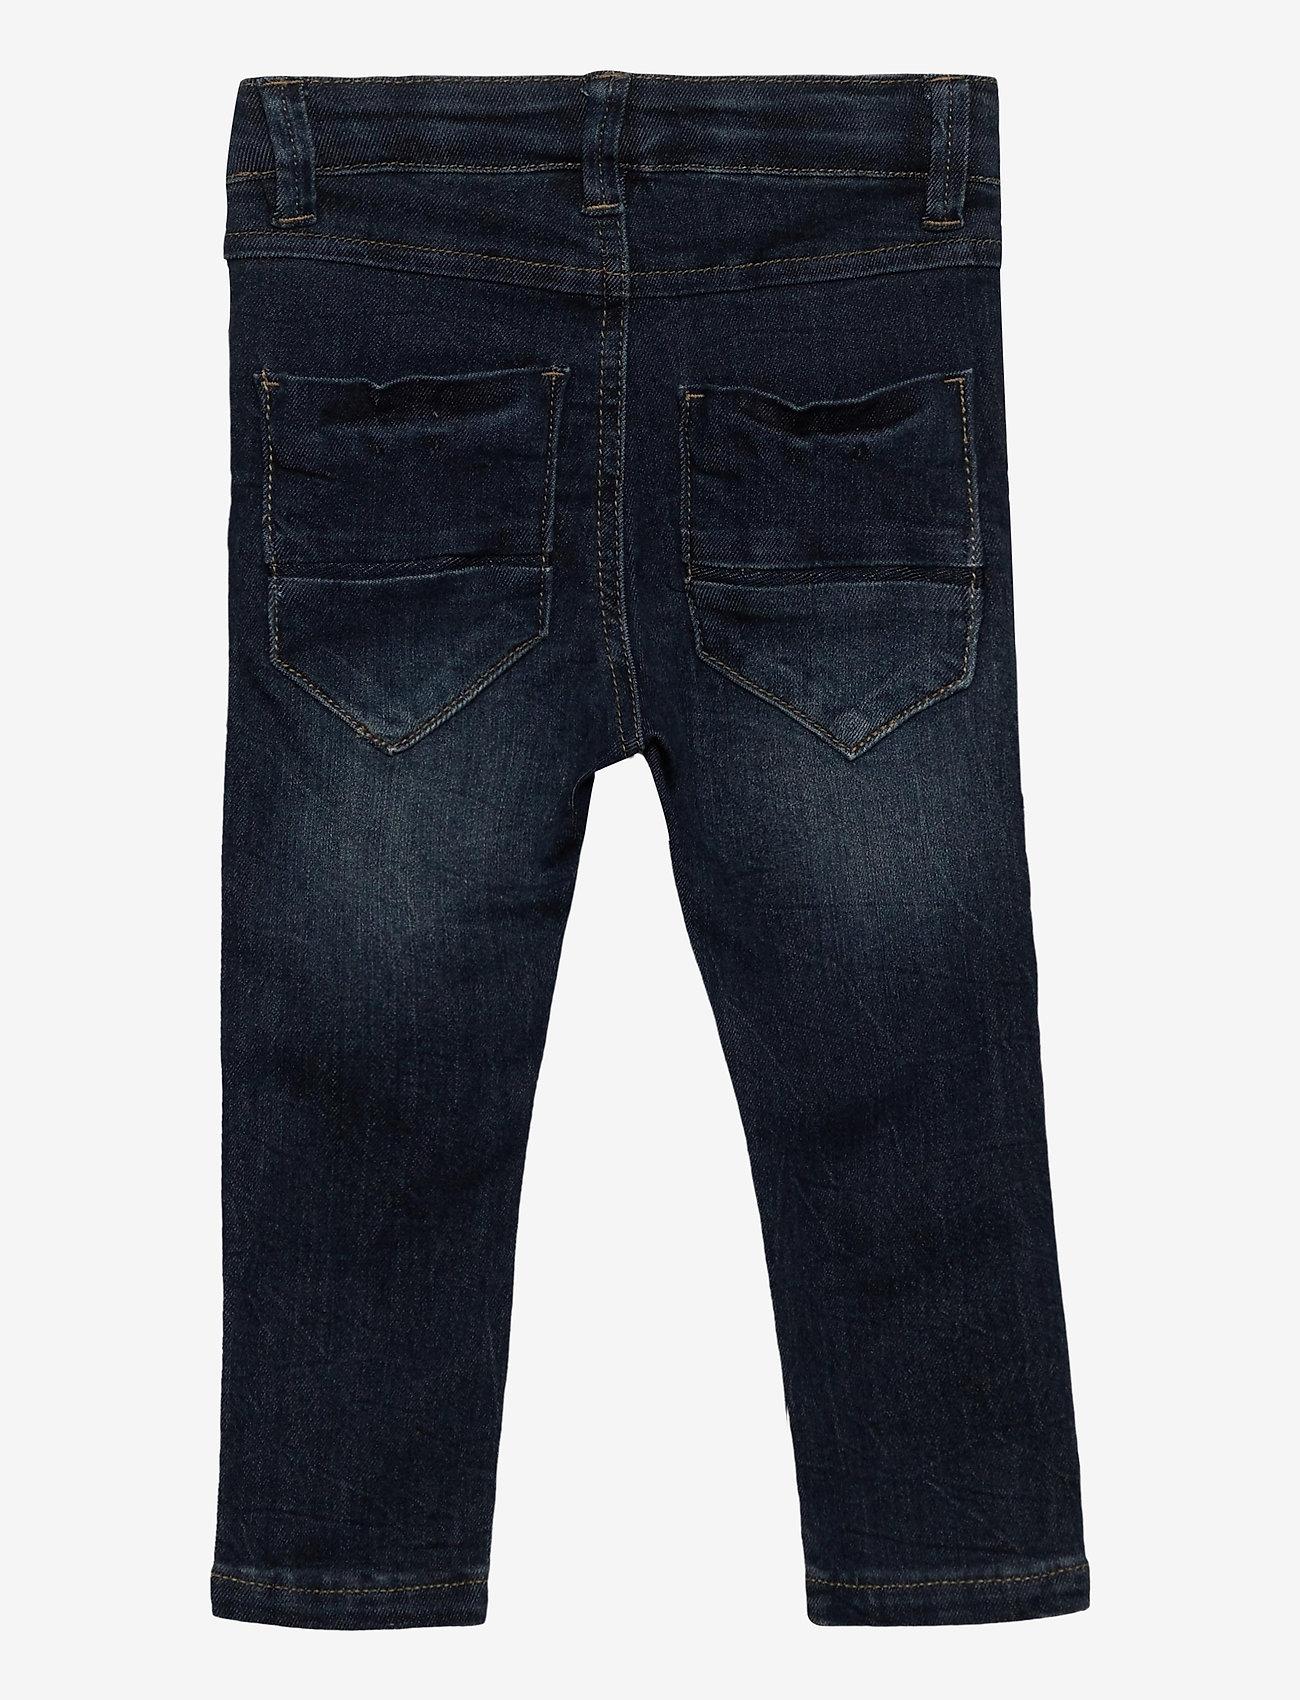 Nmmsilas Dnmtaspers 3398 Pant (Dark Blue Denim) (21.59 €) - name it JaPIw